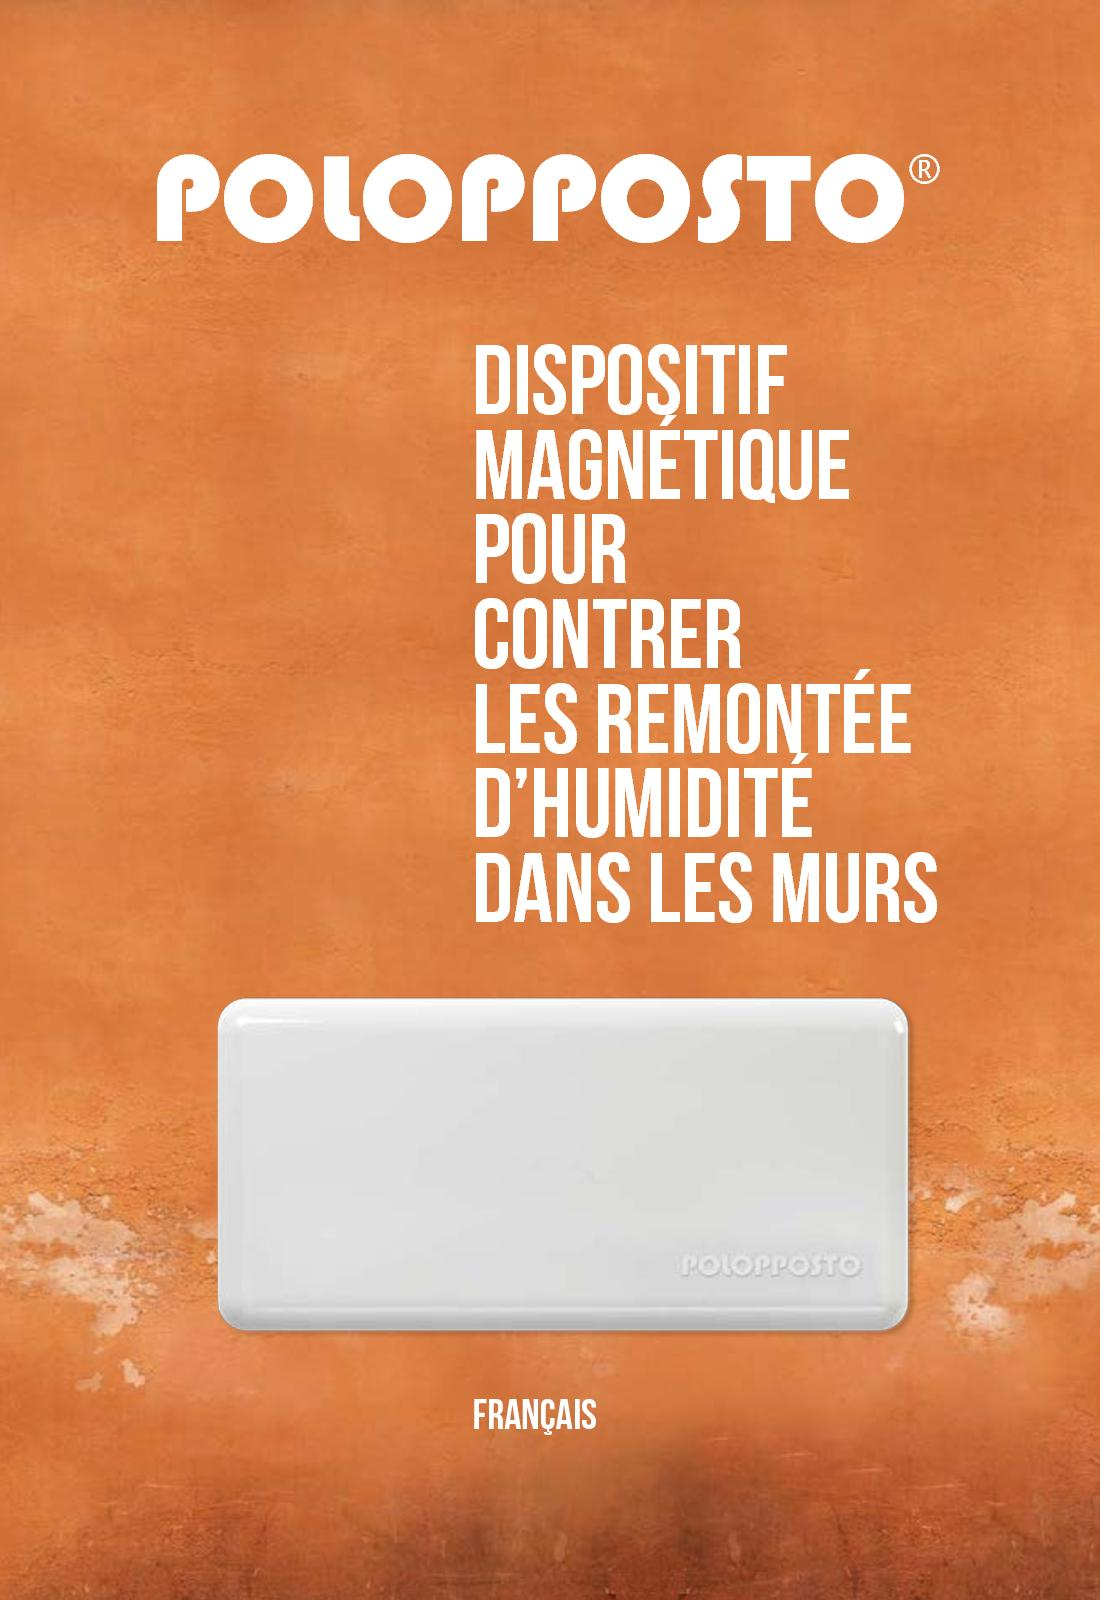 Appareil Magnétique Anti Humidité calaméo - polopposto manuel francais flip